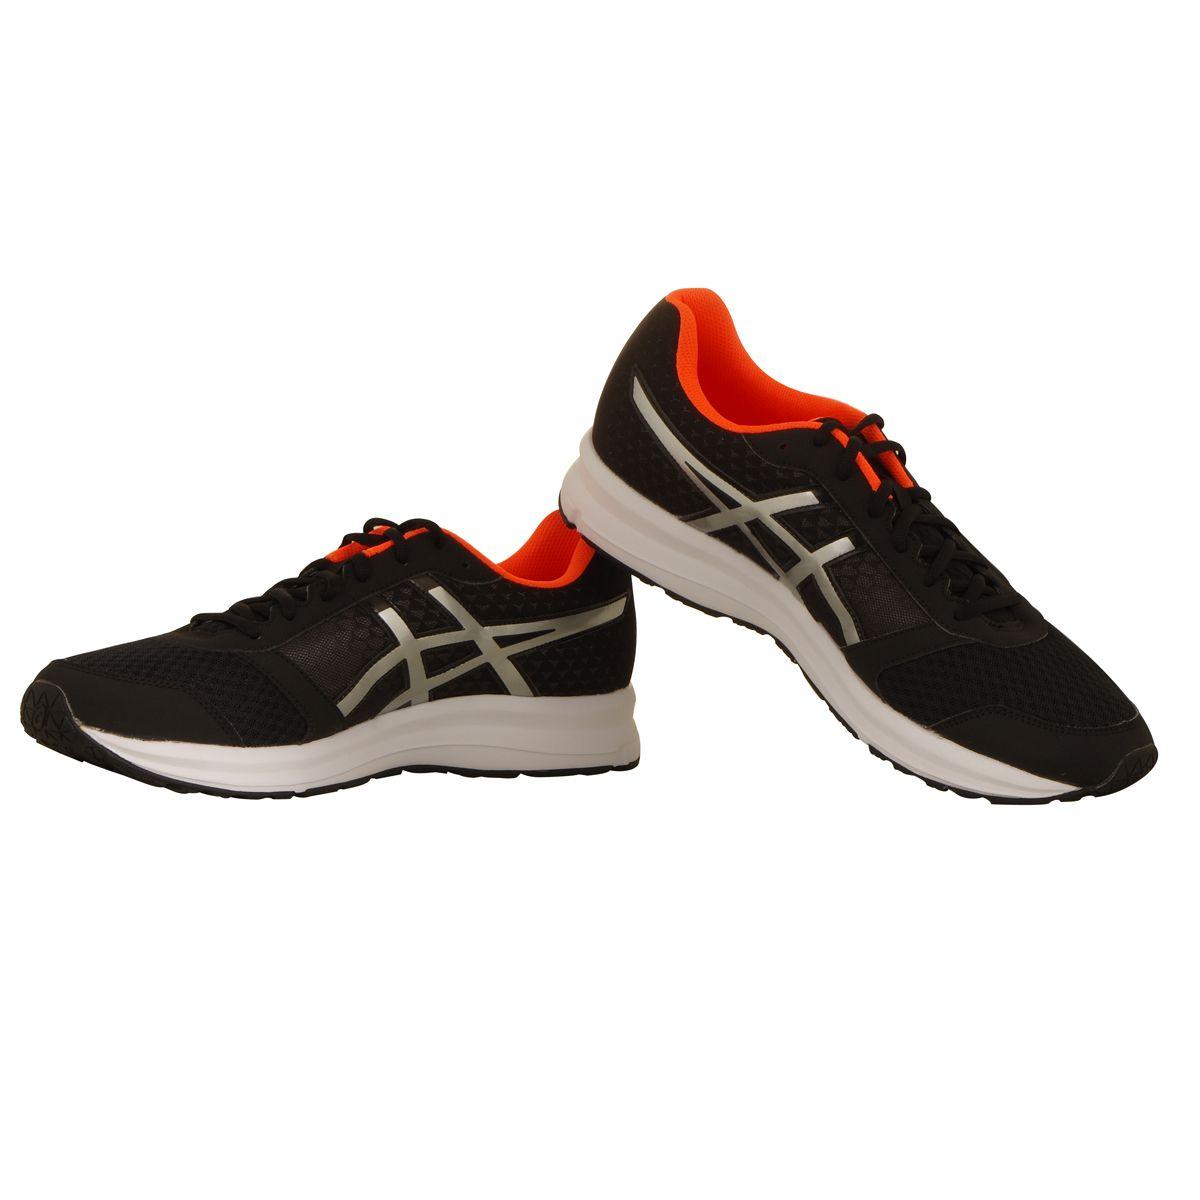 chaussures patriot 8 noir int rieur orange grande taille. Black Bedroom Furniture Sets. Home Design Ideas